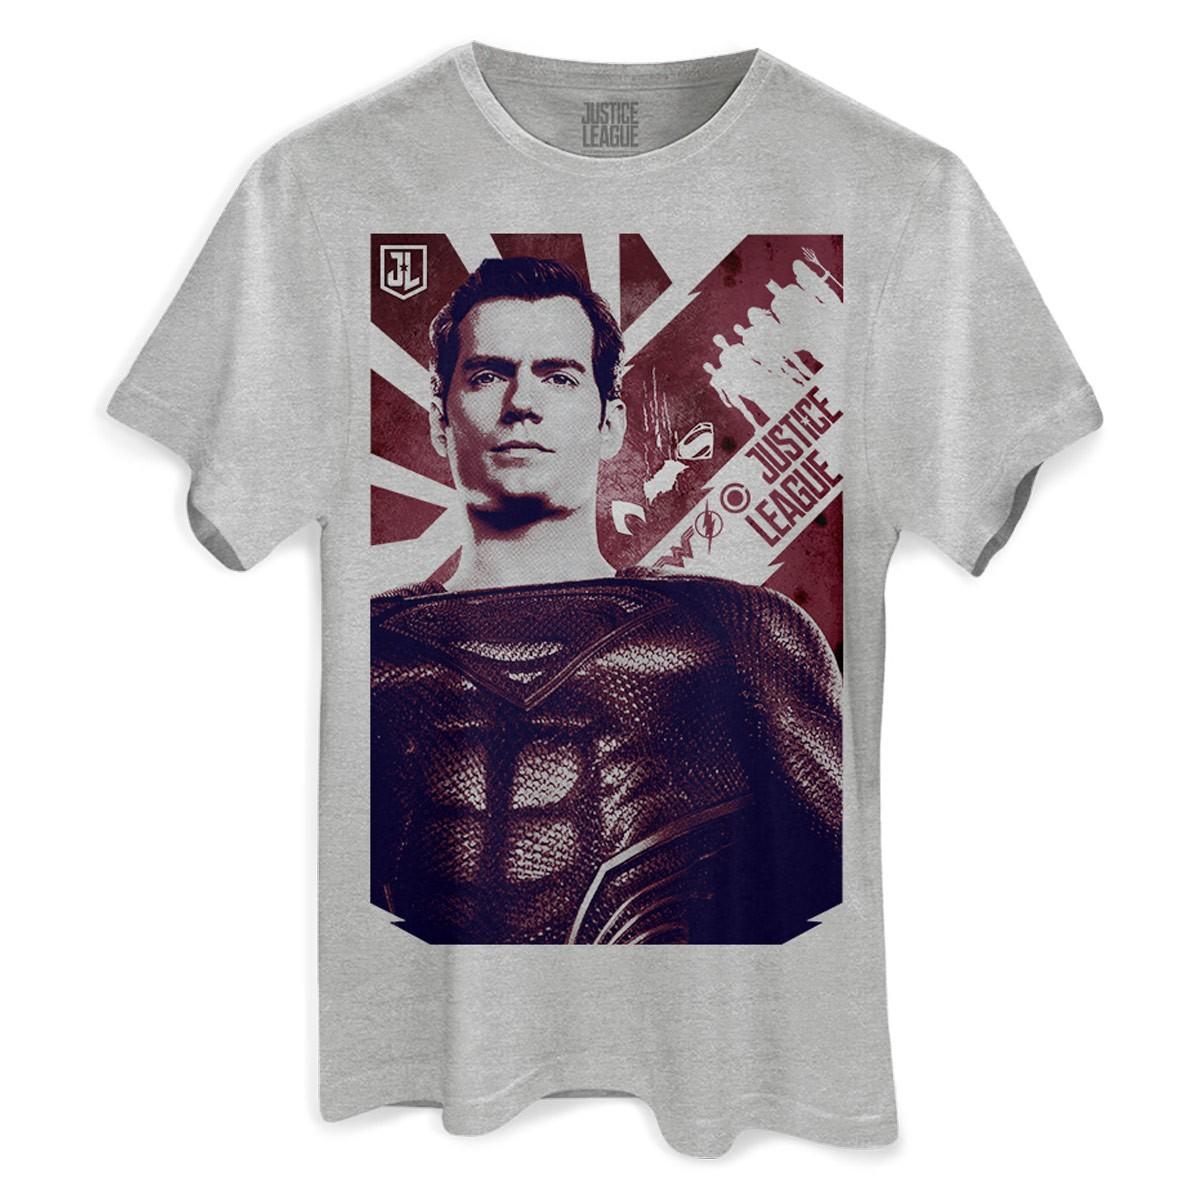 Camiseta Masculina Liga da Justiça Superman